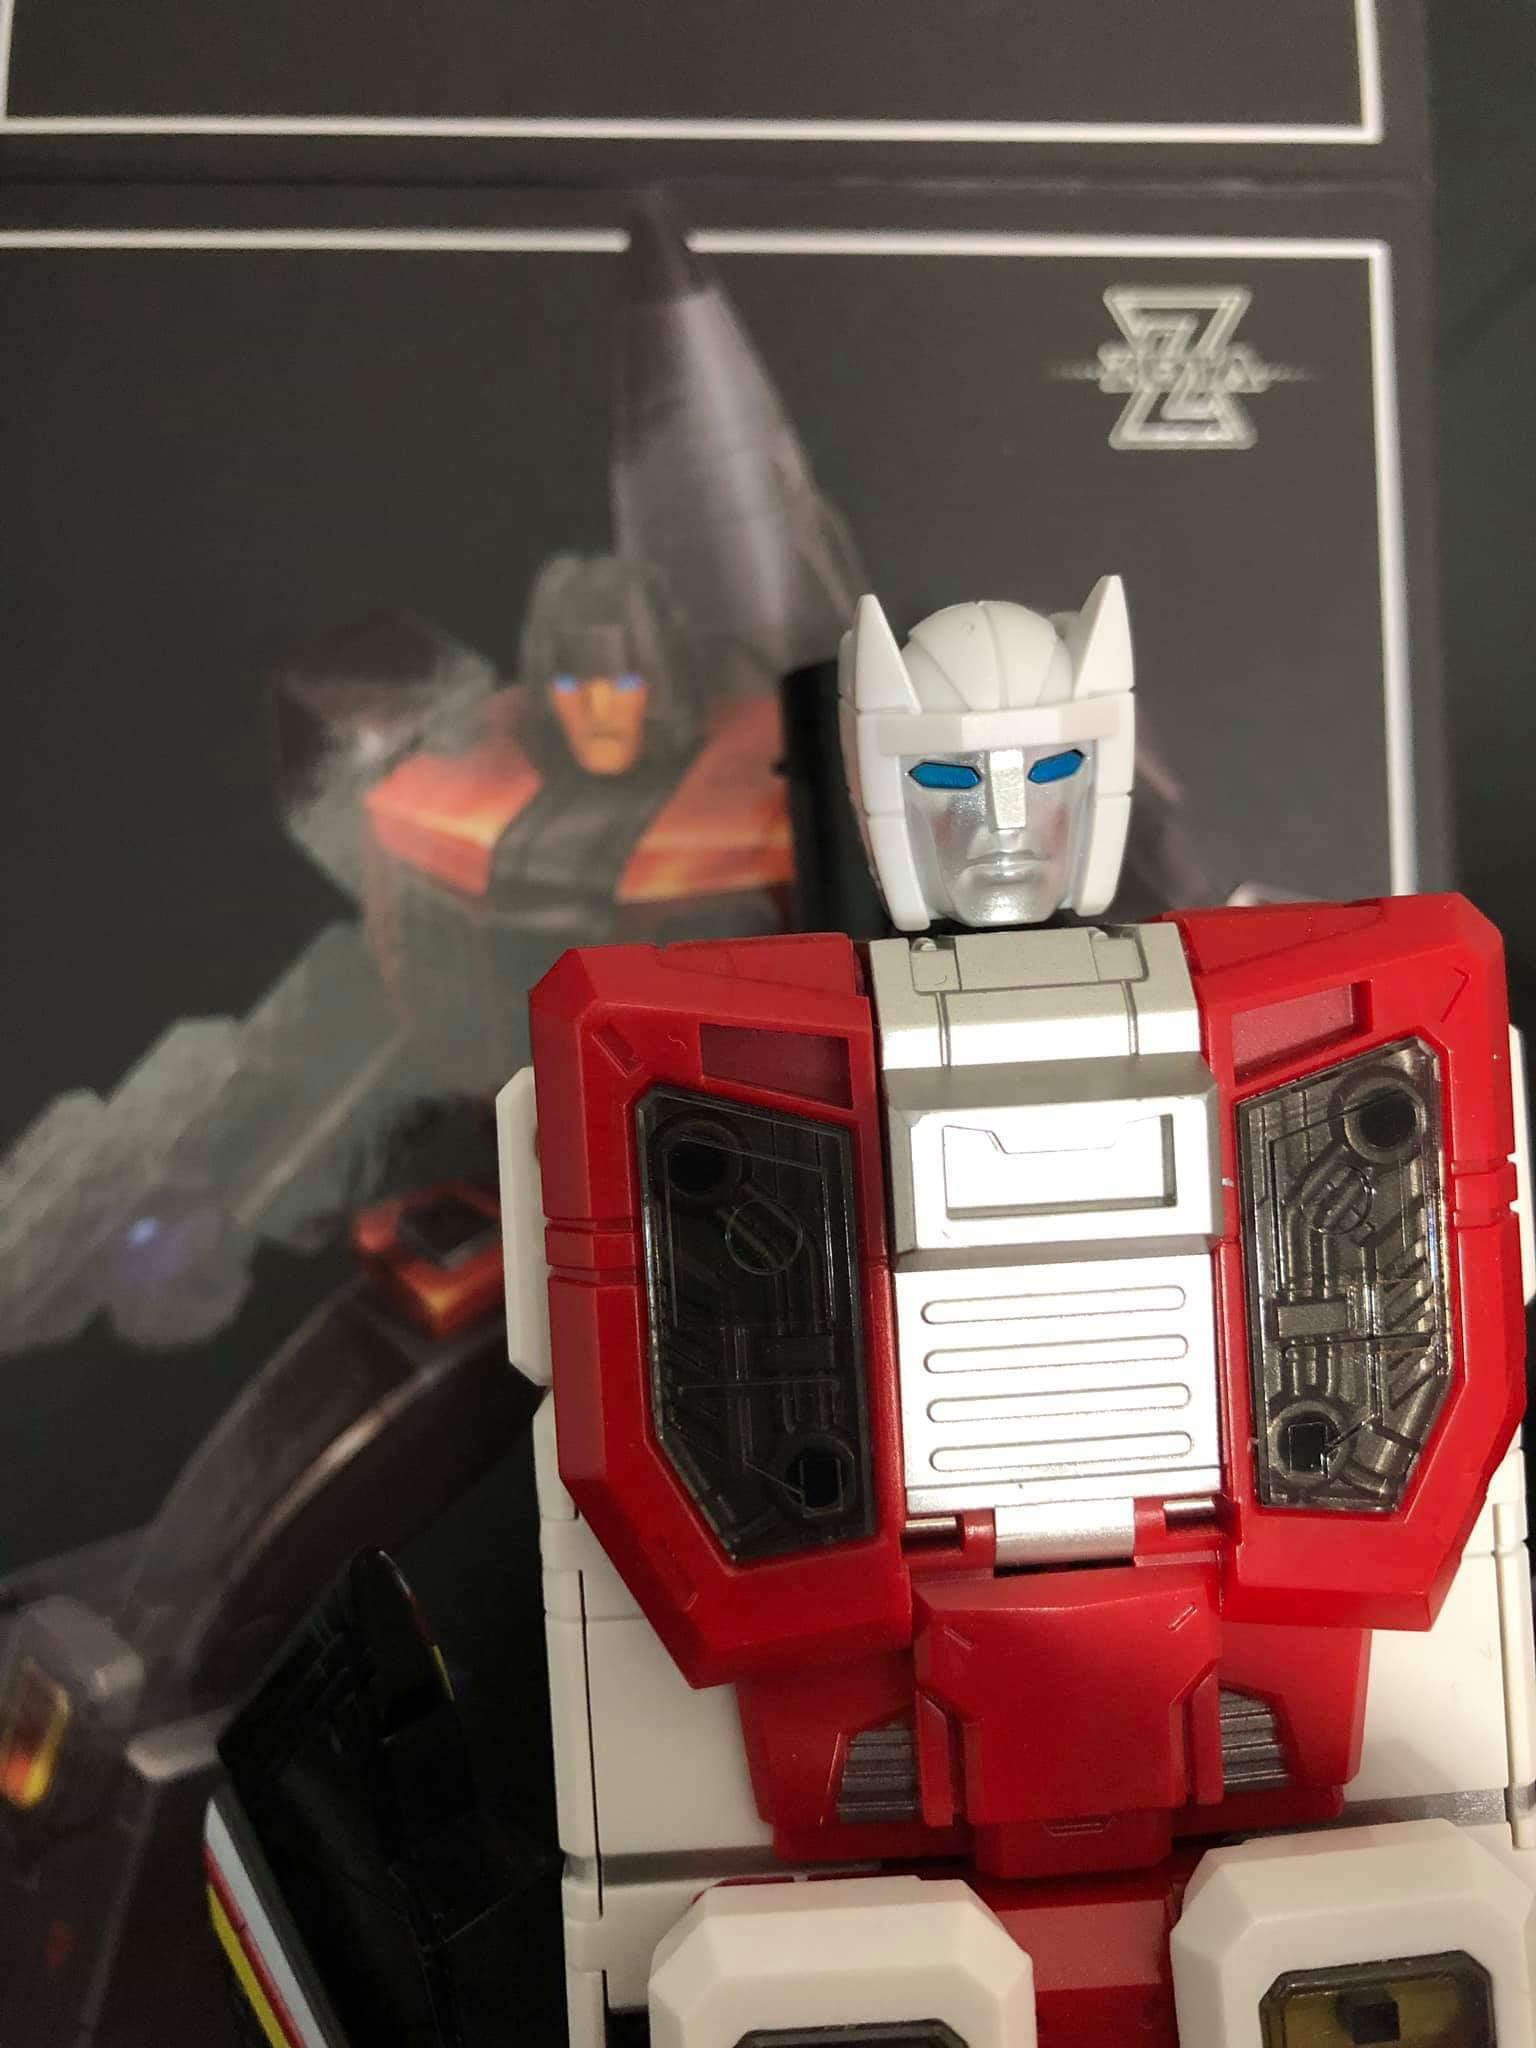 [Zeta Toys] Produit Tiers - Kronos (ZB-01 à ZB-05) - ZB-06 Superitron - aka Superion - Page 4 LdSIhU70_o